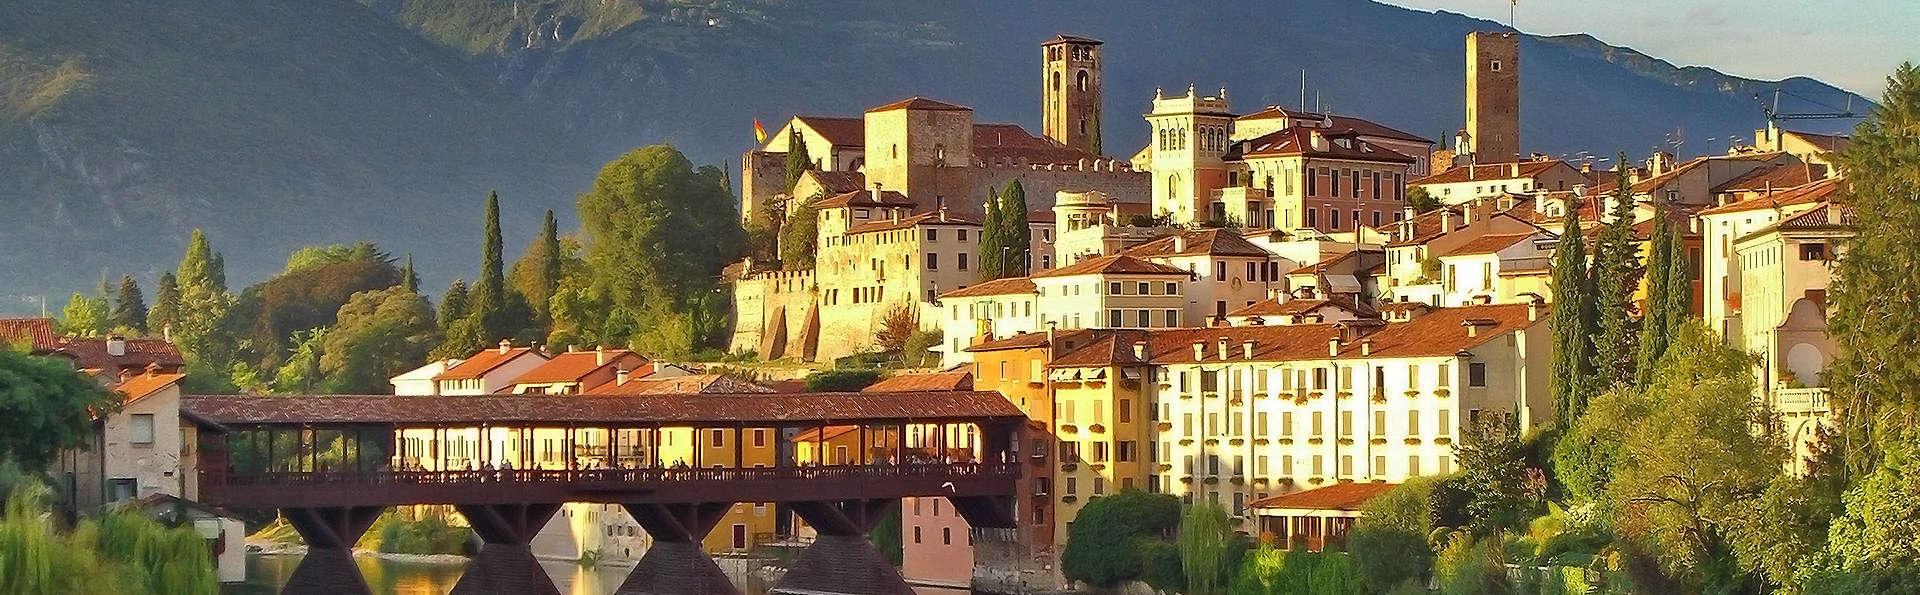 Best Western Plus Hotel Villa Tacchi - edit_Bassano_del_Grappa_Abendstimmung_vicenza.jpg